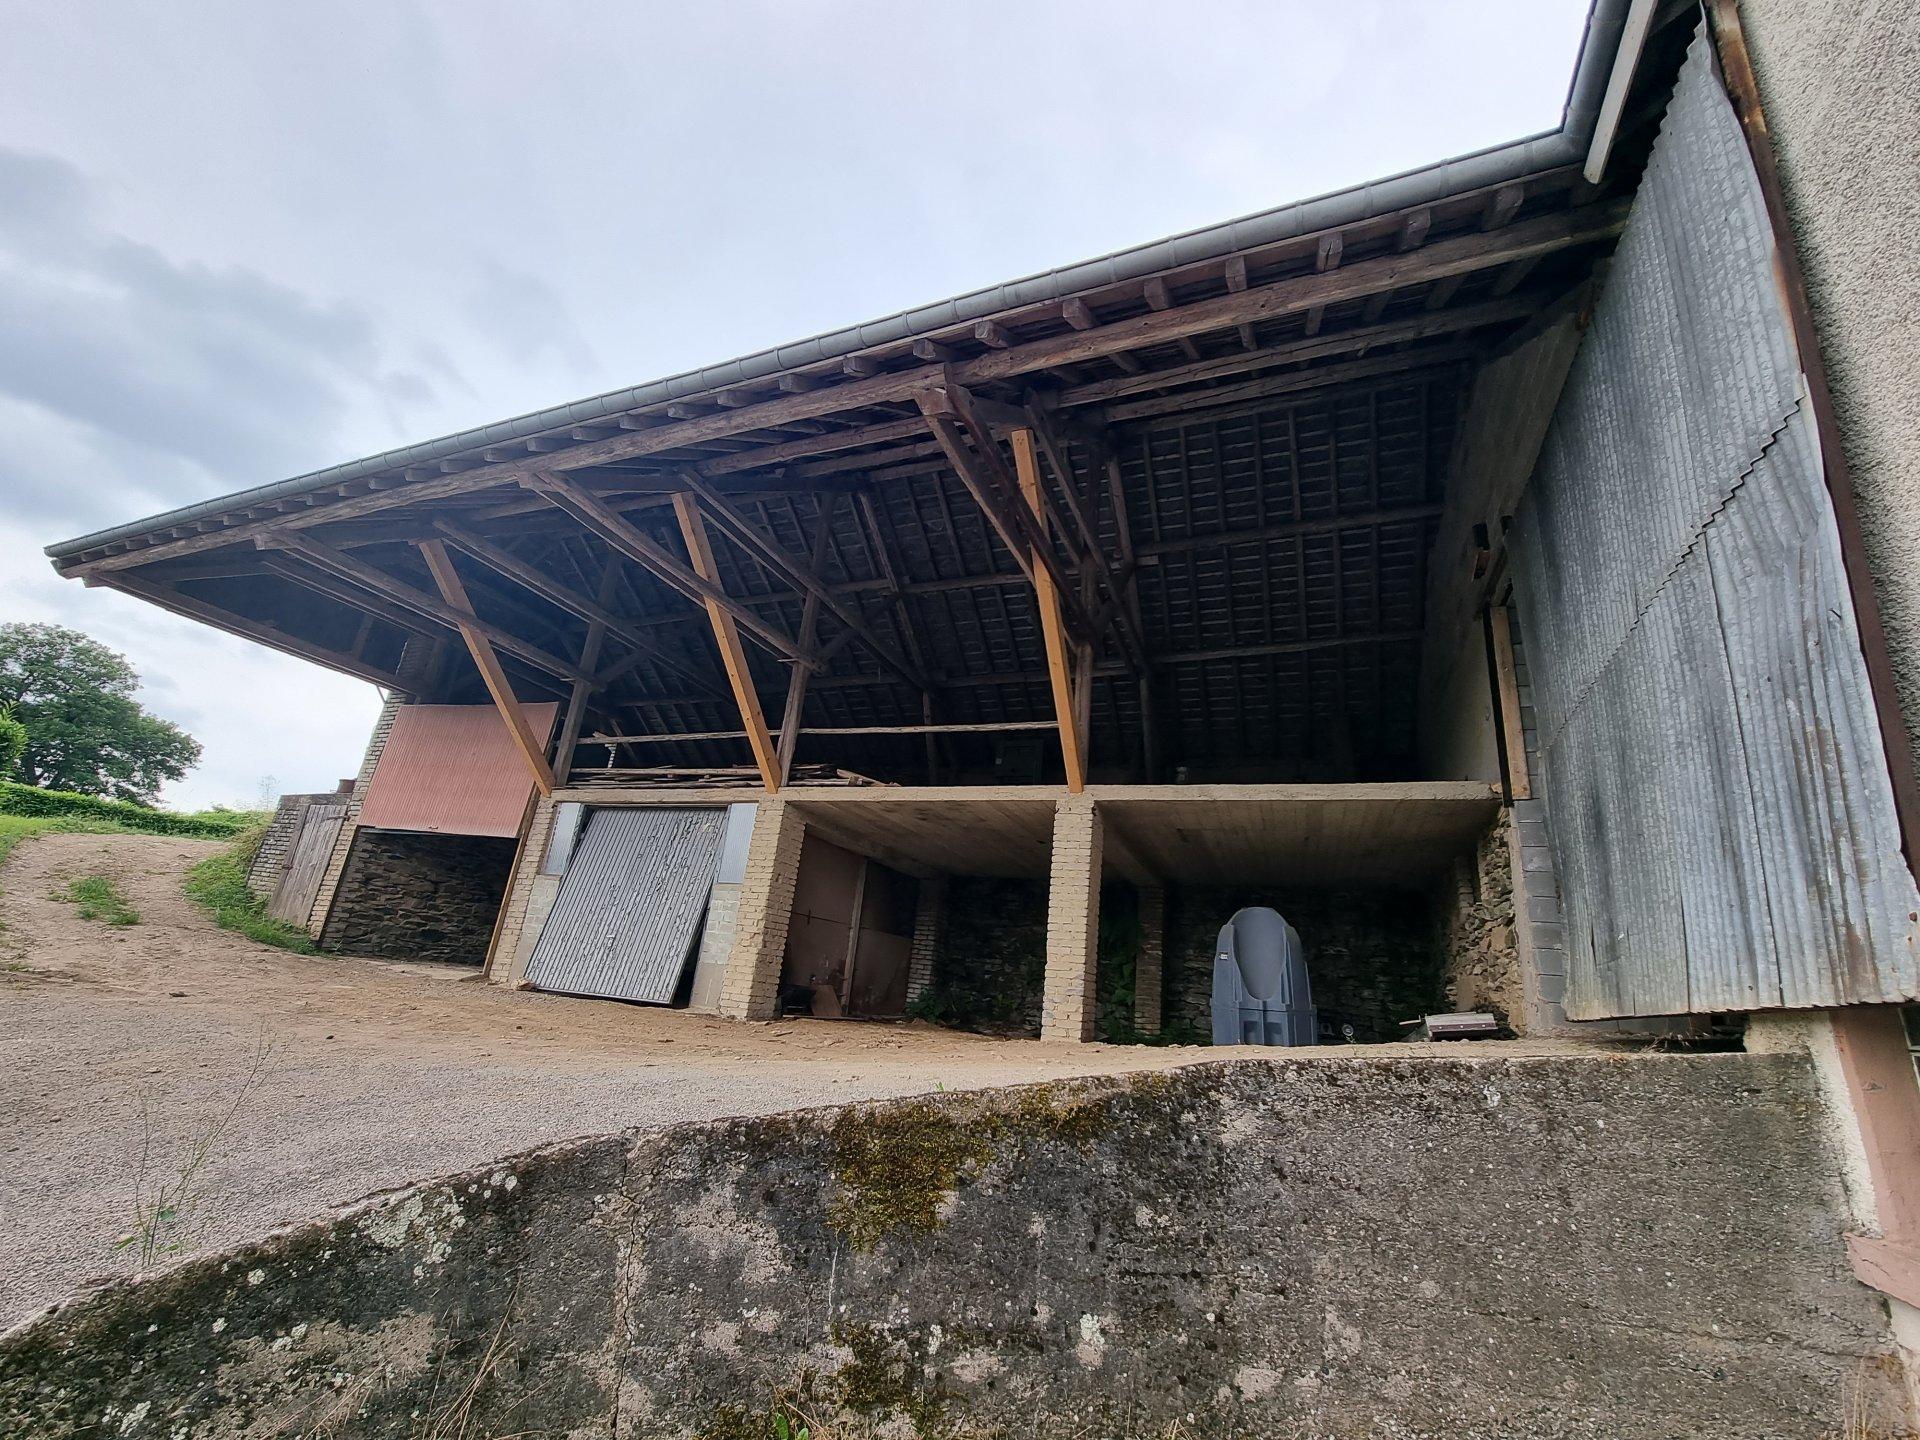 Ancienne hangar a demolir avec possibilité d'aménager 2 lots